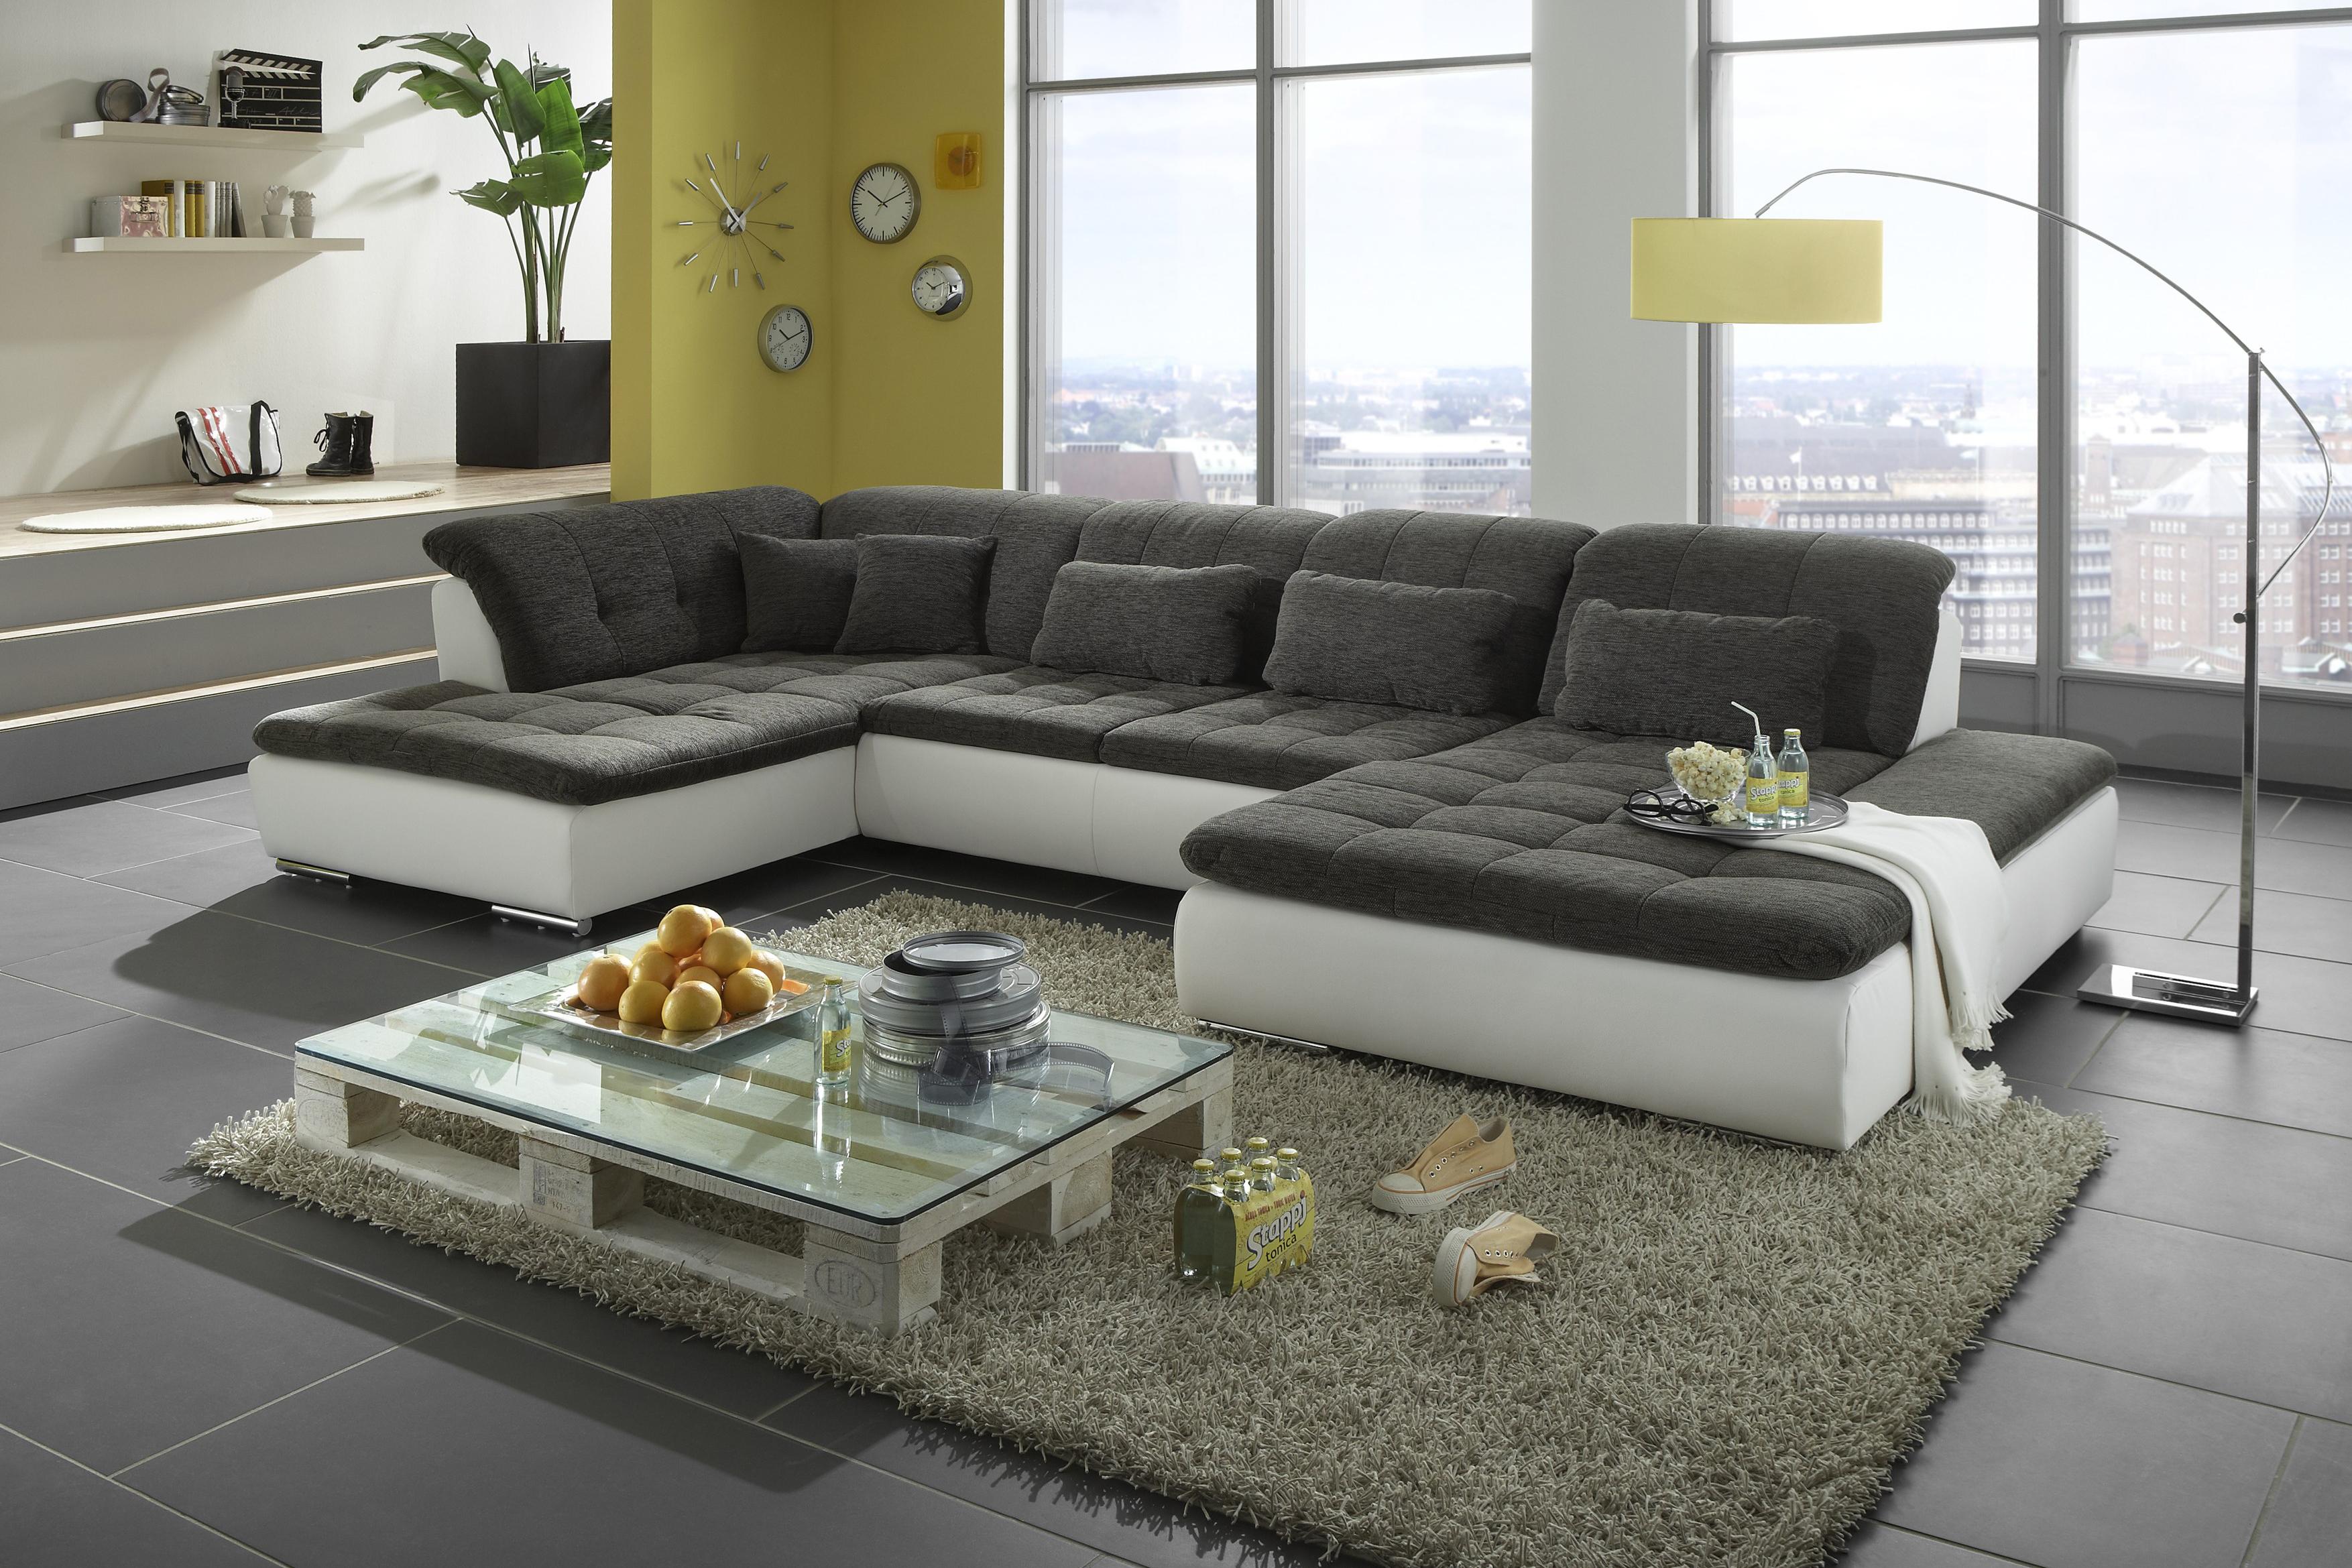 megapol couchgarnitur lomo wei grau m bel letz ihr online shop. Black Bedroom Furniture Sets. Home Design Ideas